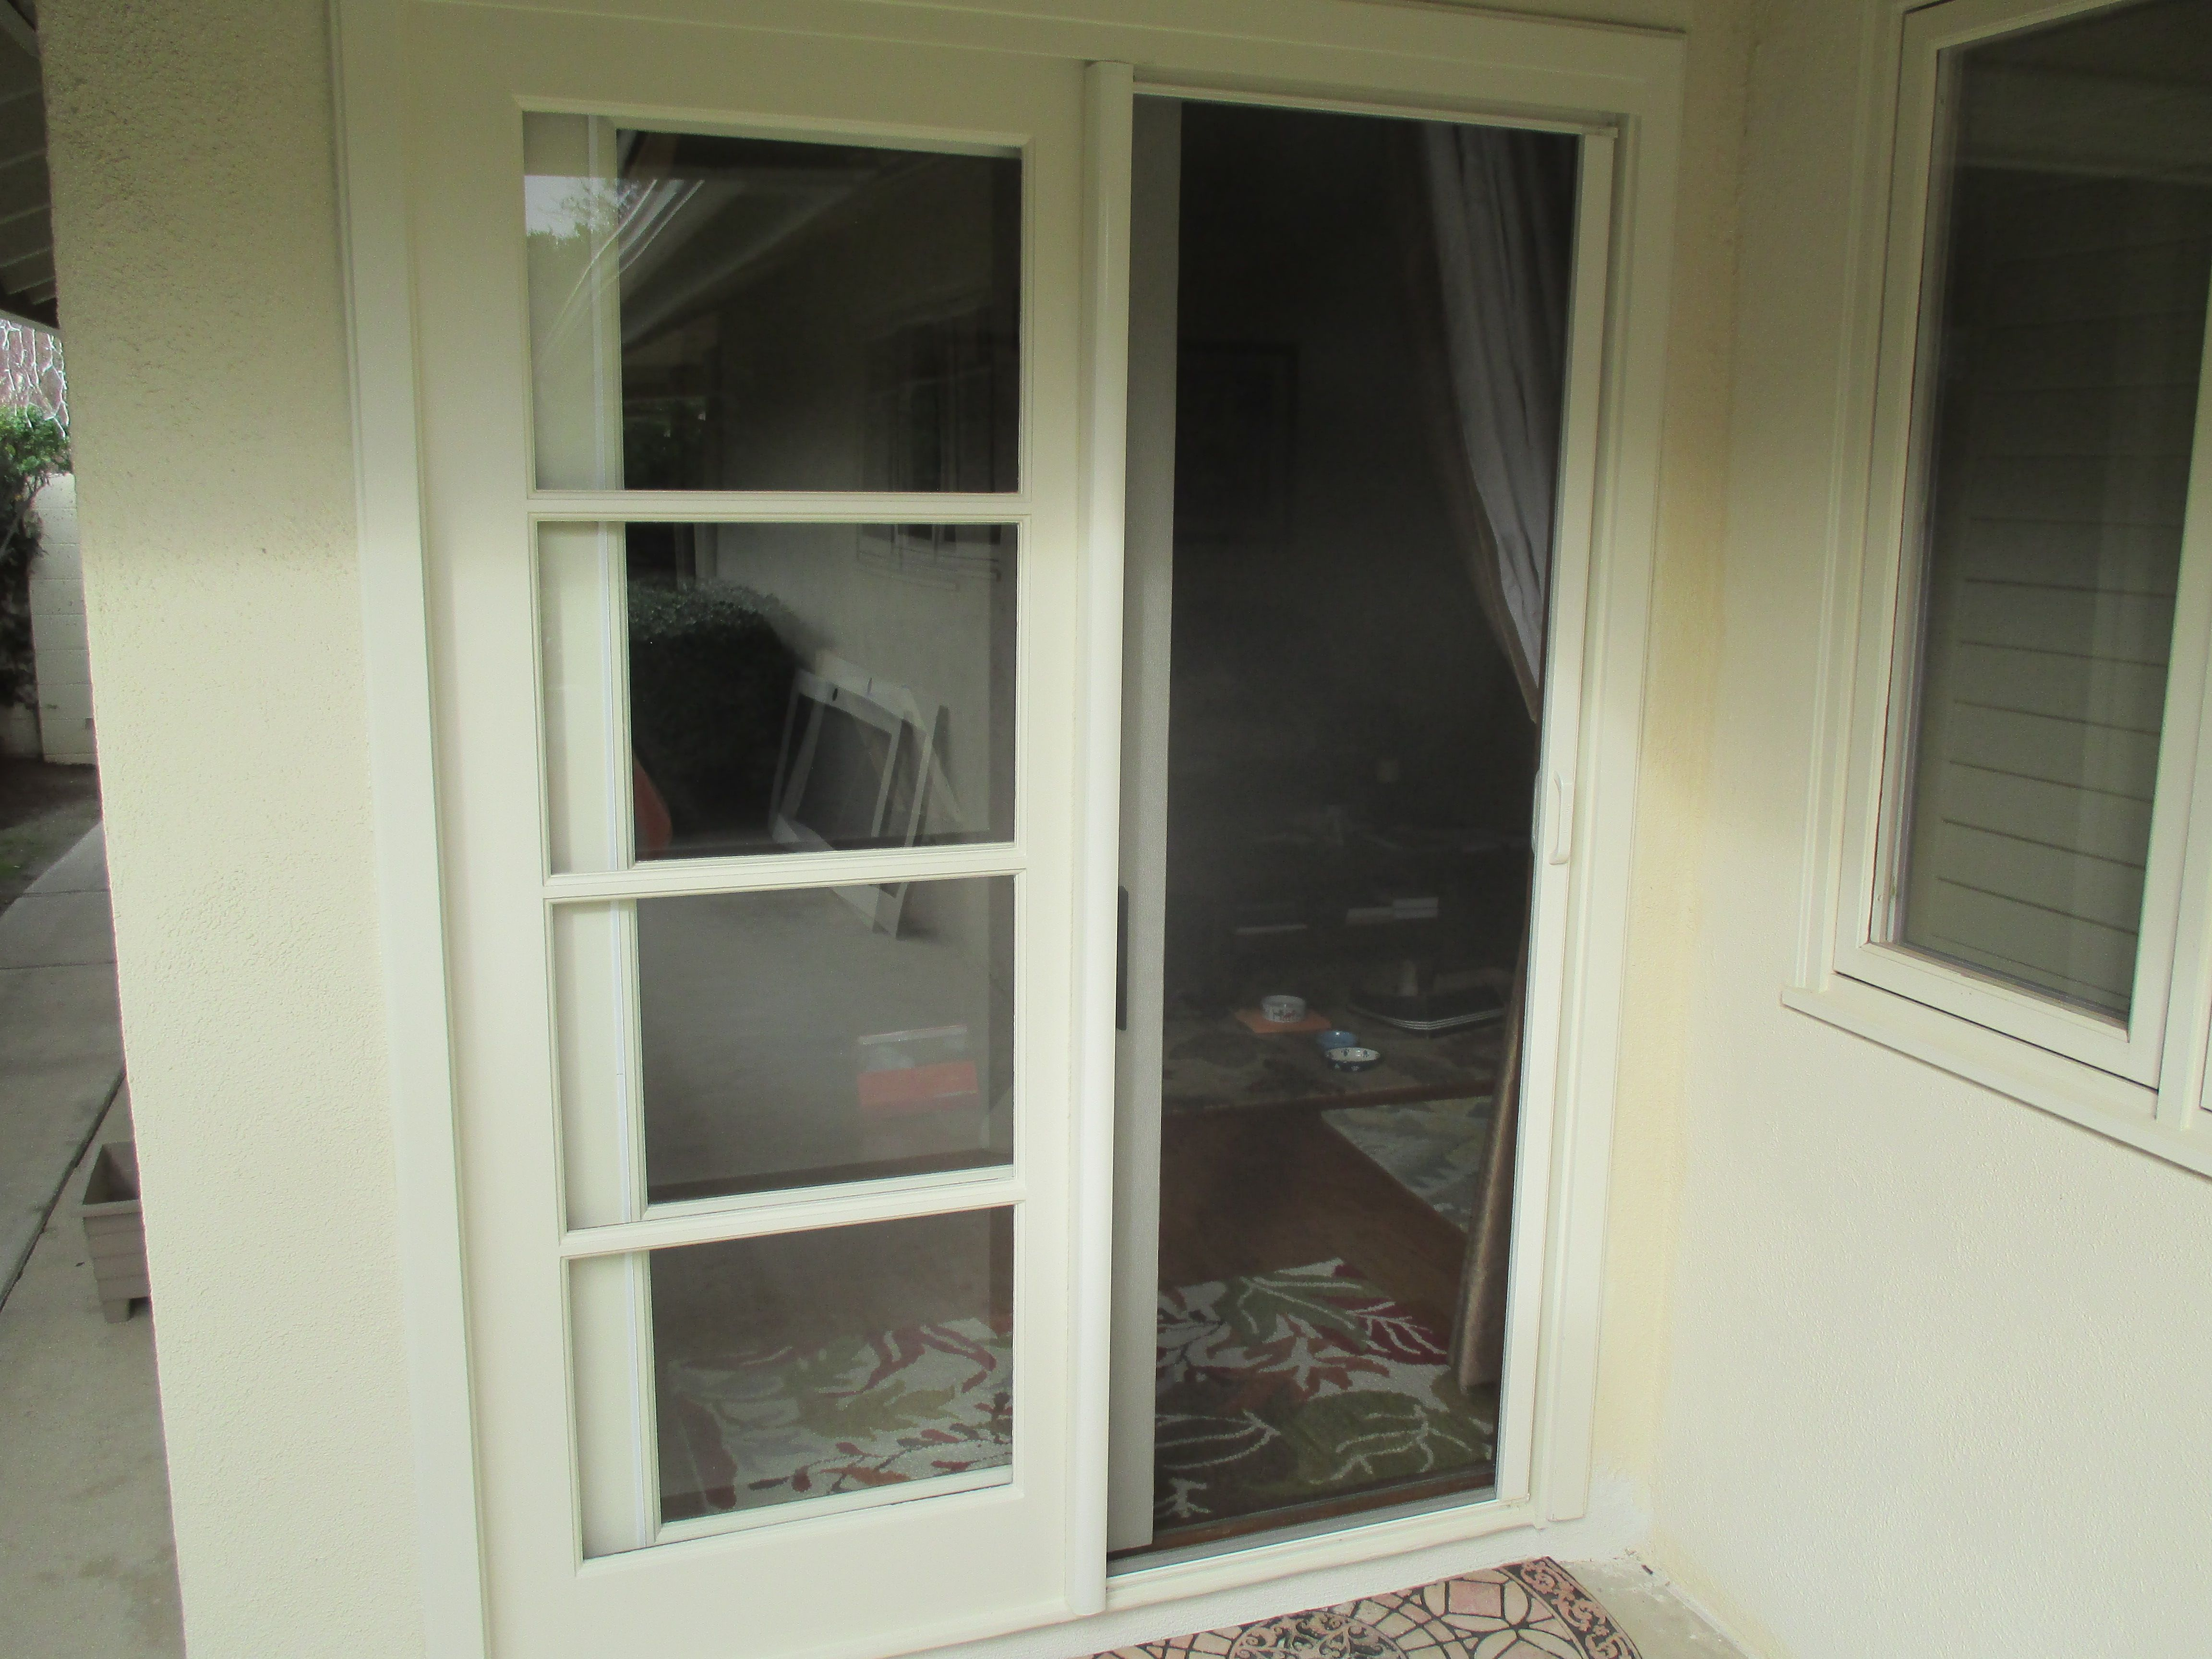 Here We Have A White Single Stowaway Retractable Screen Door W